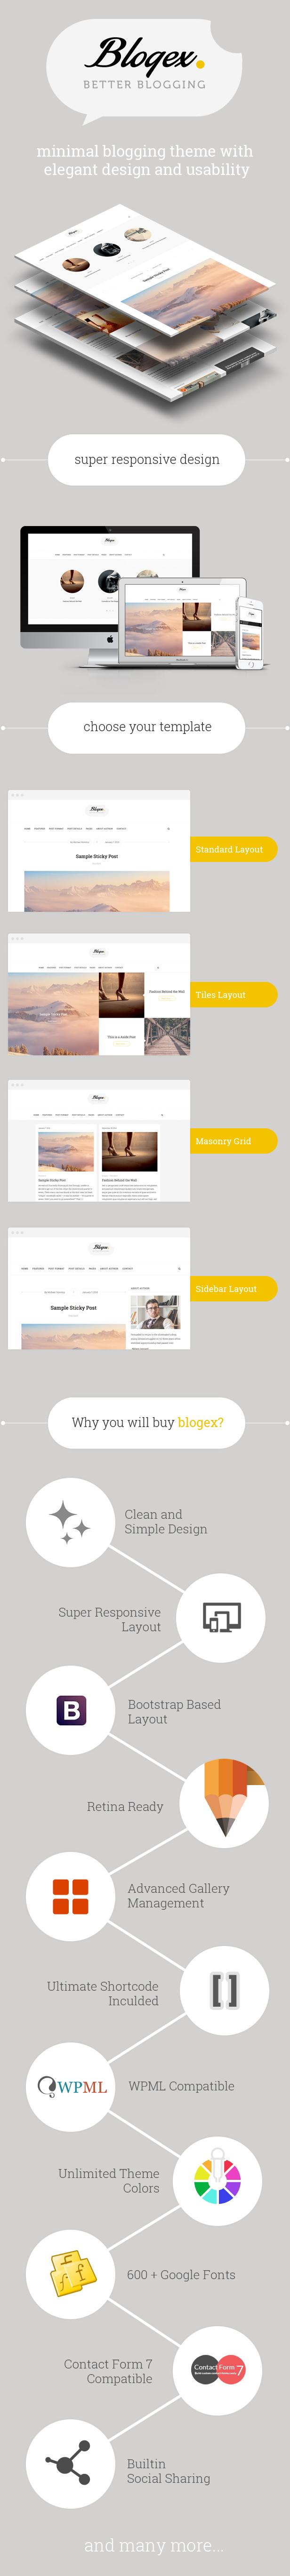 WordPress theme Blogex - Minimal Responsive Wordpress Blog Theme (Personal)